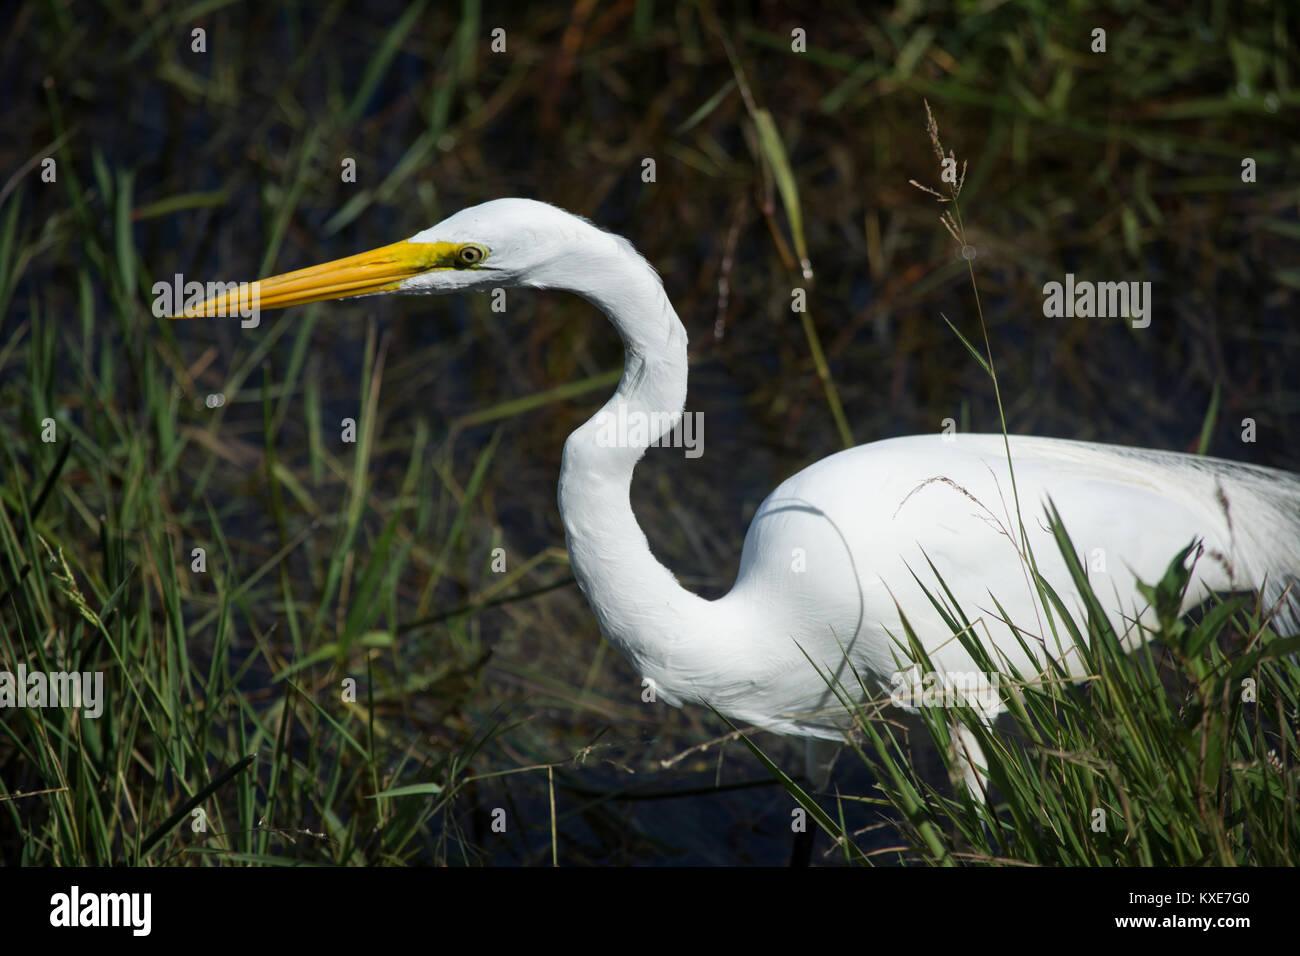 Great Egret (Ardea alba) from Miami-Dade County, Florida, USA. - Stock Image